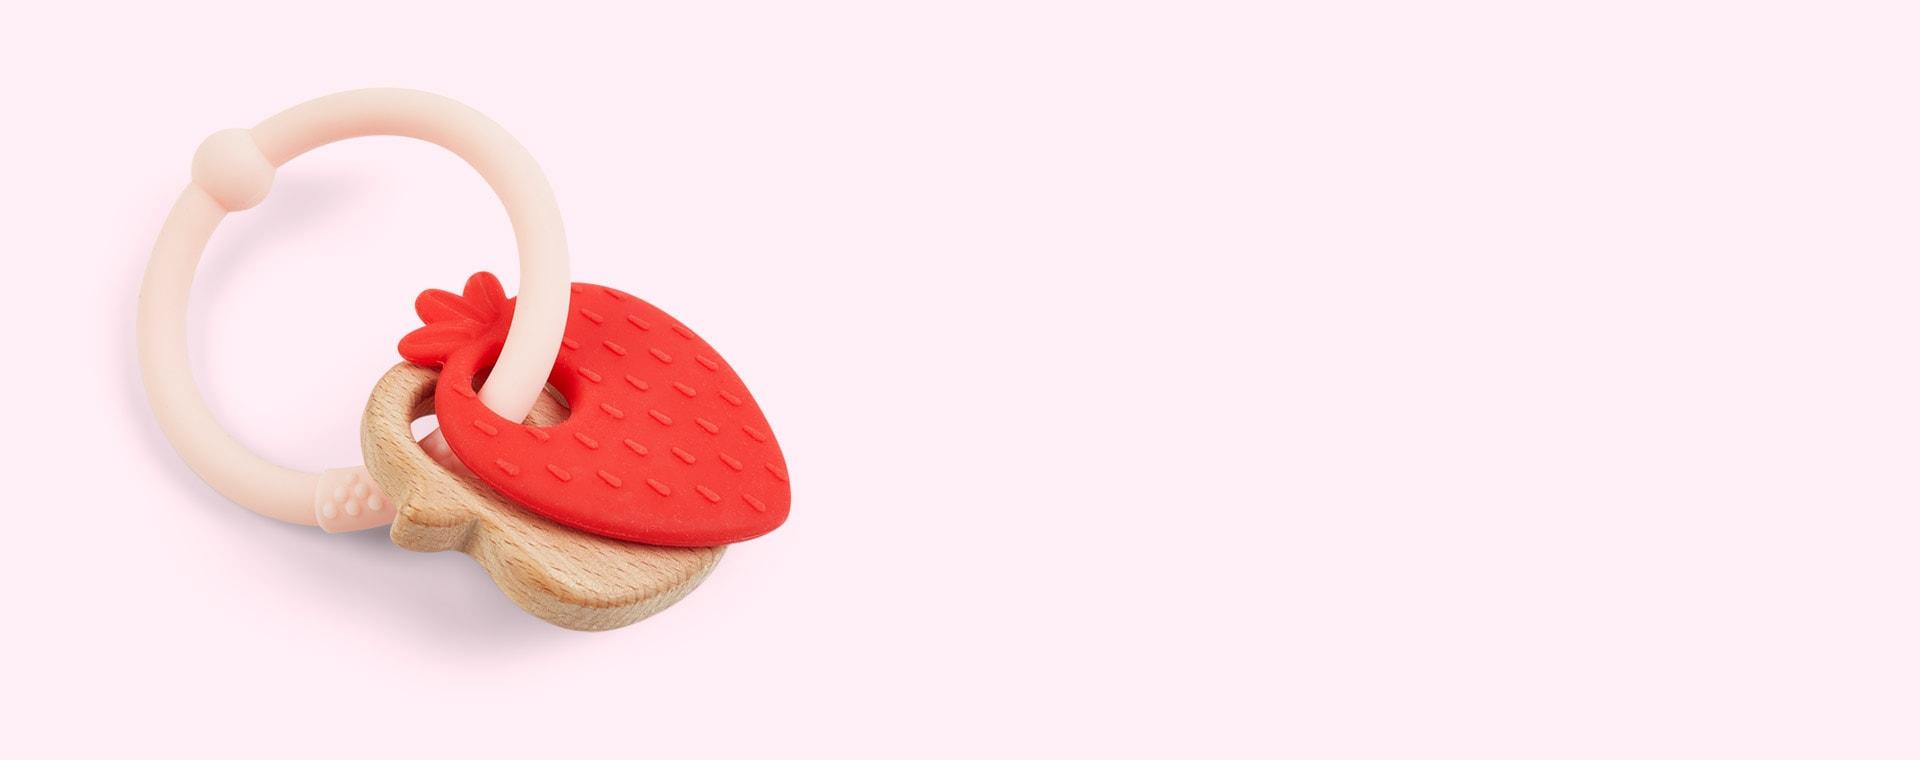 Strawberry Nattou Silicone Wood Rattle Teether